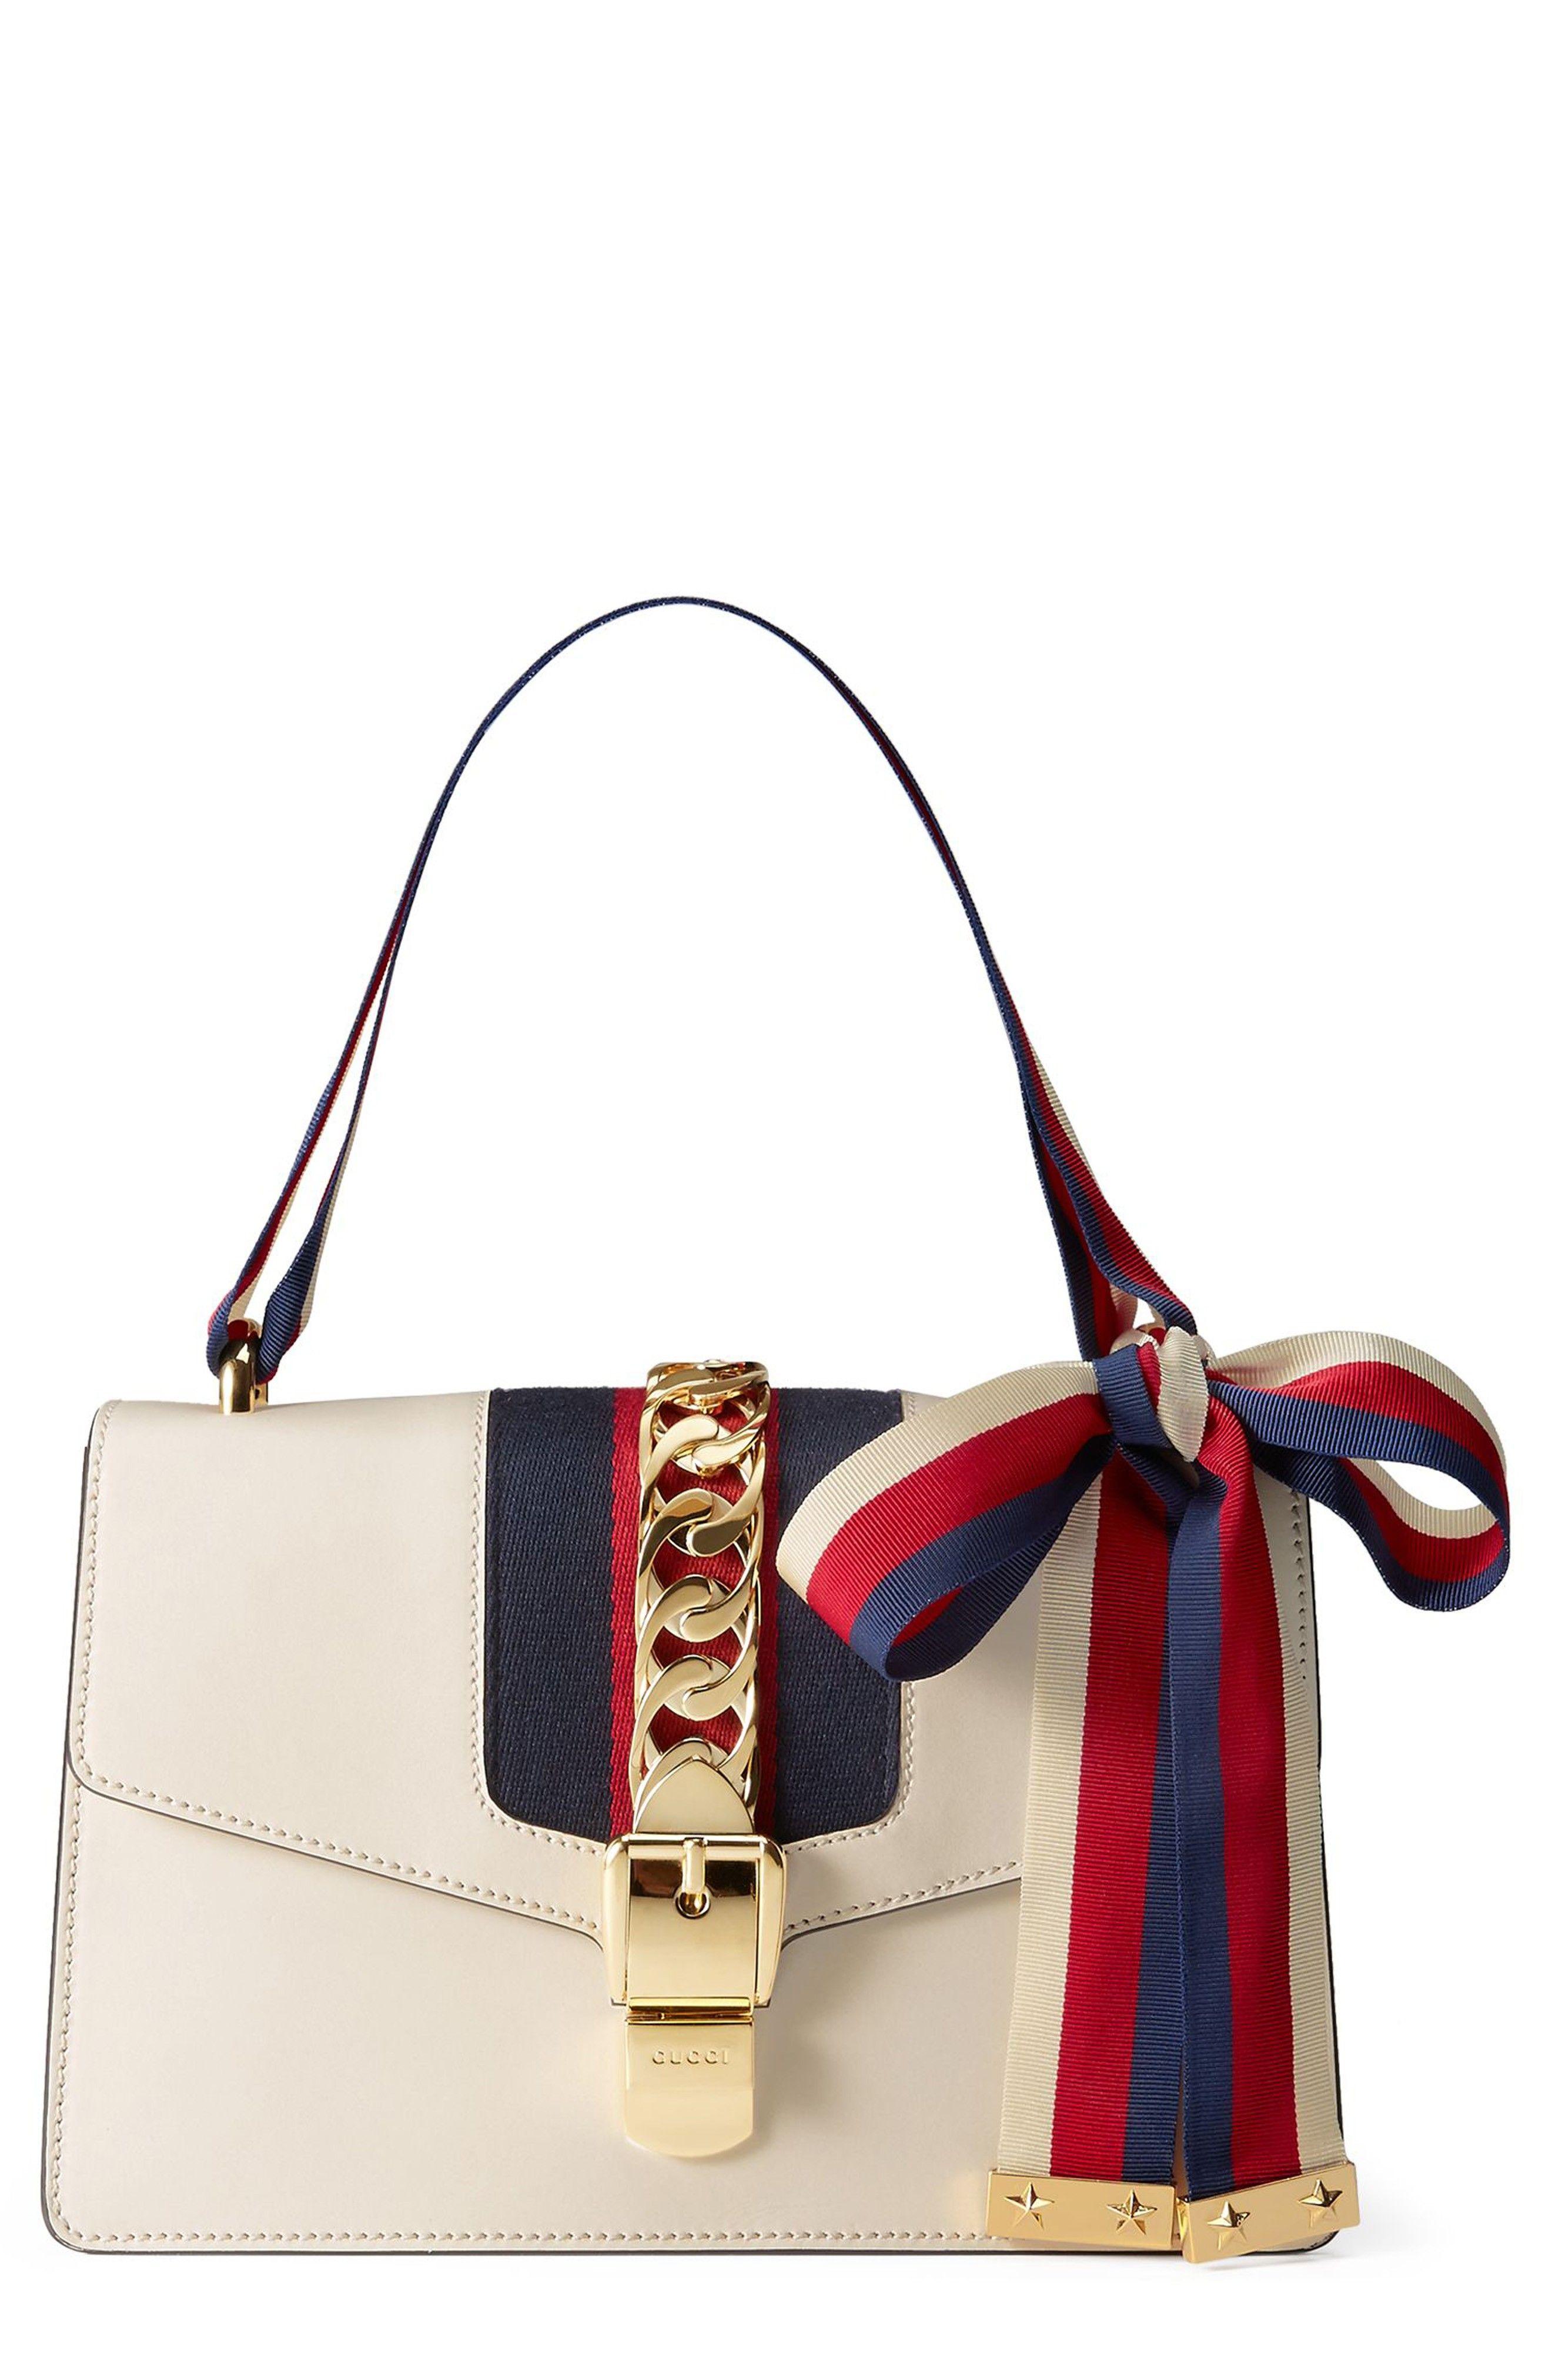 84a11e9ca Darling Gucci Leather Shoulder Bag | high fashion | Gucci, Bags ...